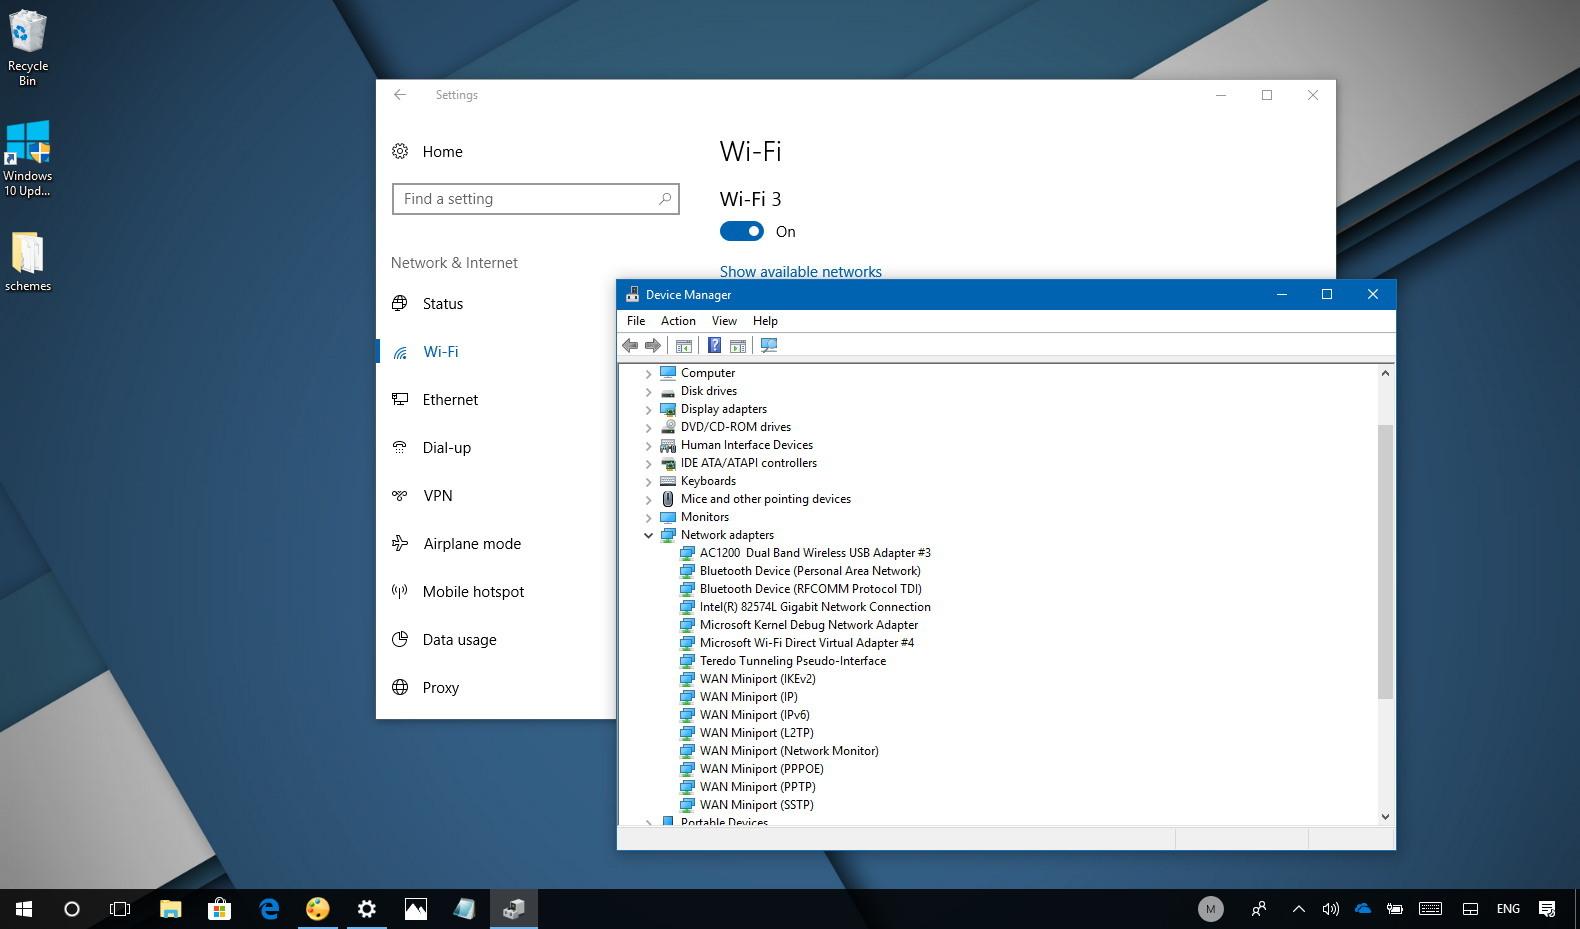 Fix disconnecting Wi-Fi on Windows 10